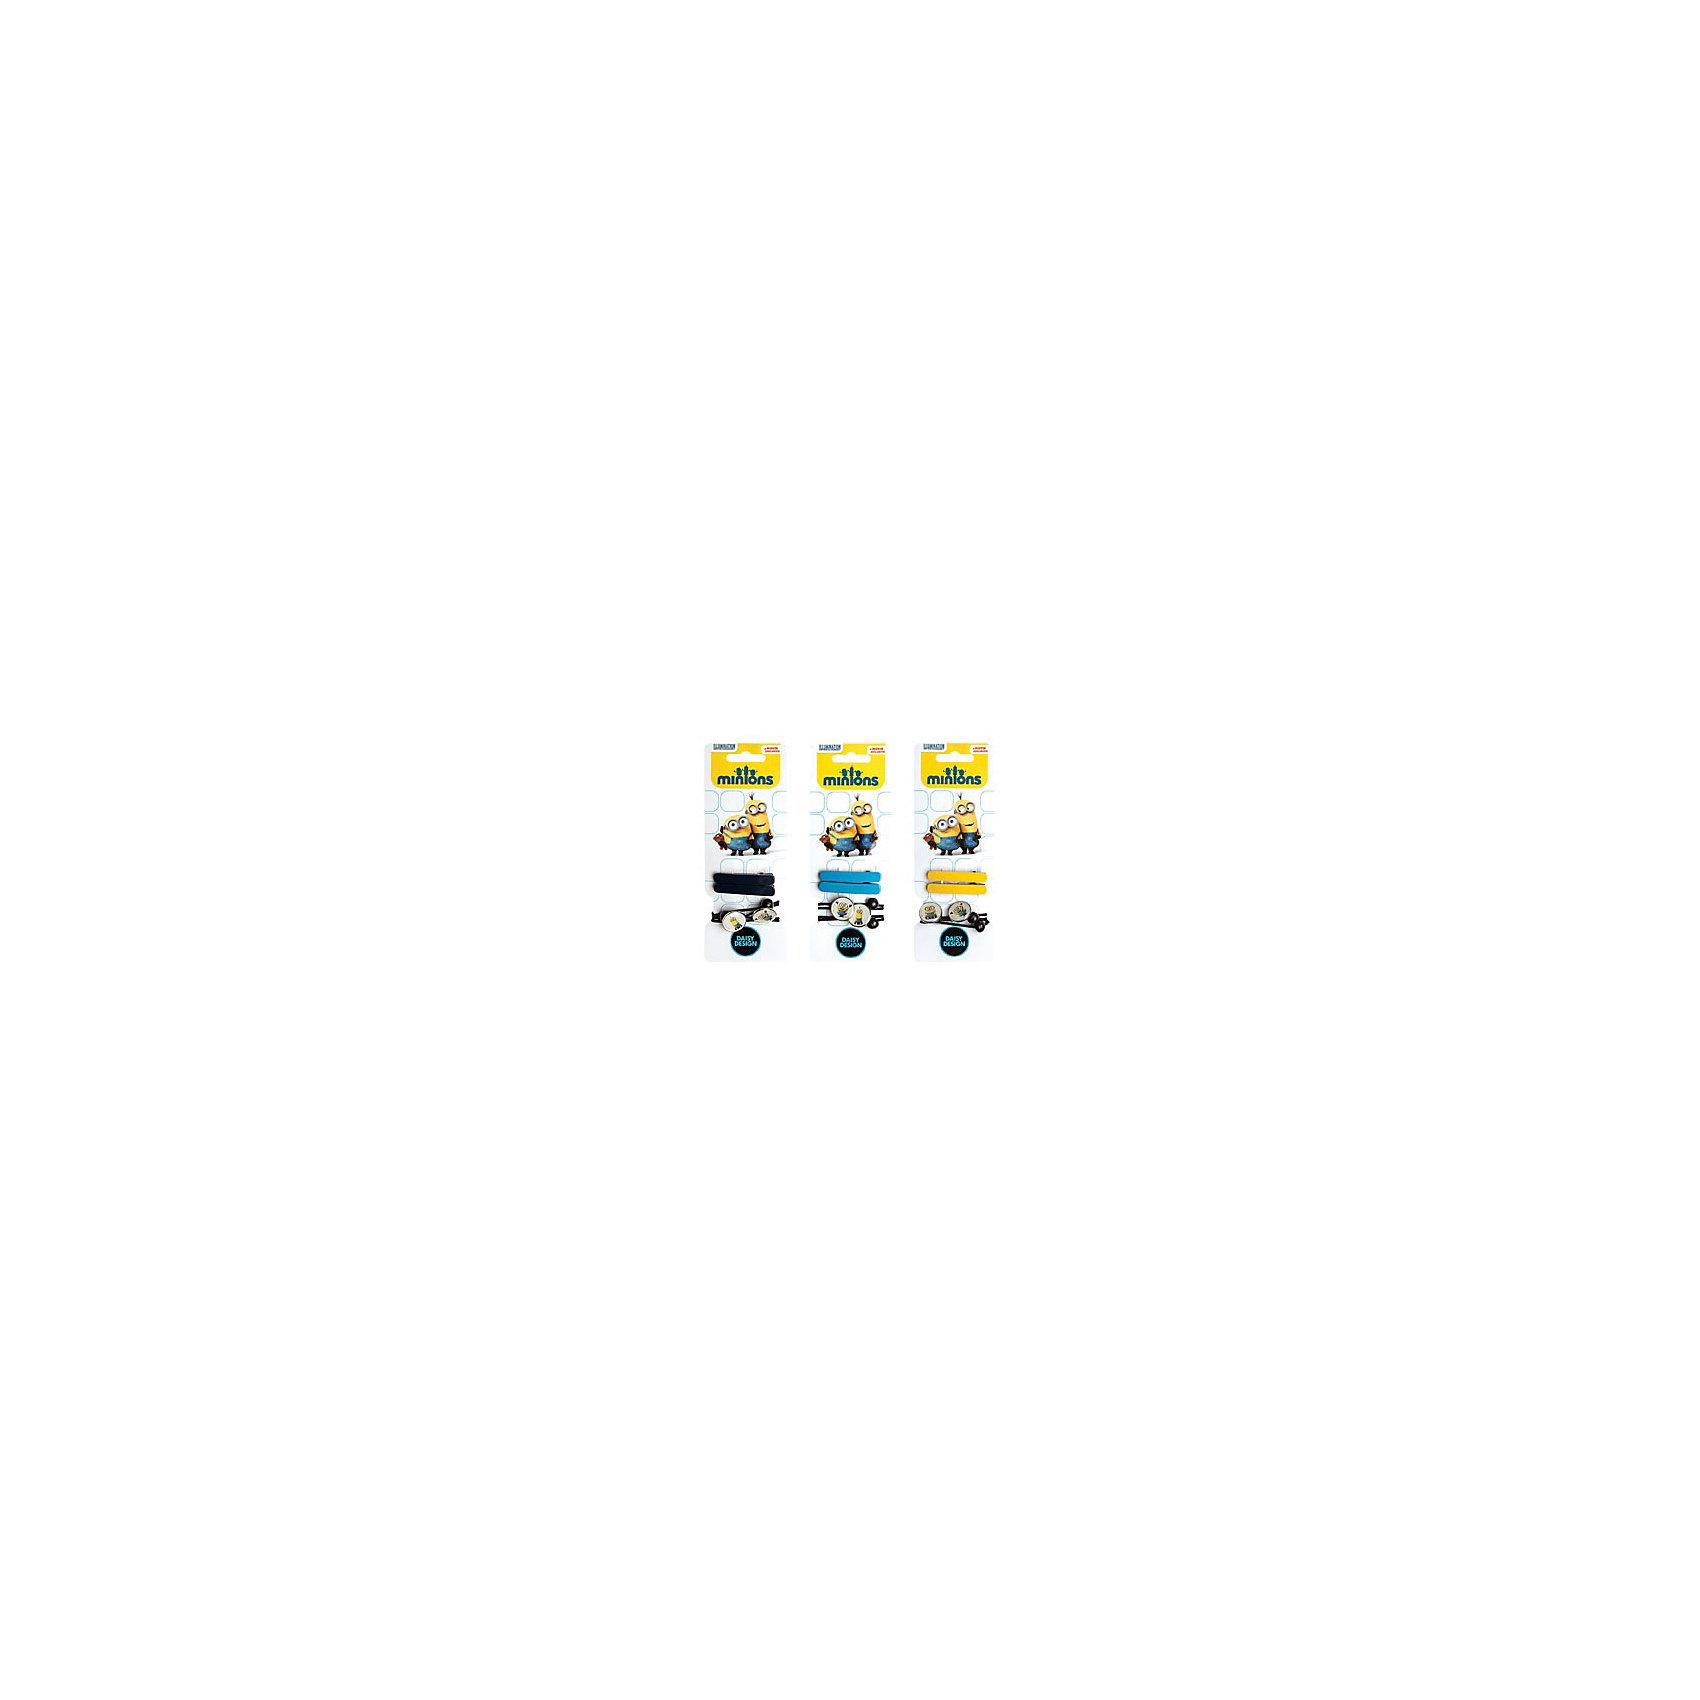 Набор аксессуаров для волос МиньонАксессуары<br><br><br>Ширина мм: 170<br>Глубина мм: 157<br>Высота мм: 67<br>Вес г: 117<br>Возраст от месяцев: 36<br>Возраст до месяцев: 2147483647<br>Пол: Женский<br>Возраст: Детский<br>SKU: 4623738